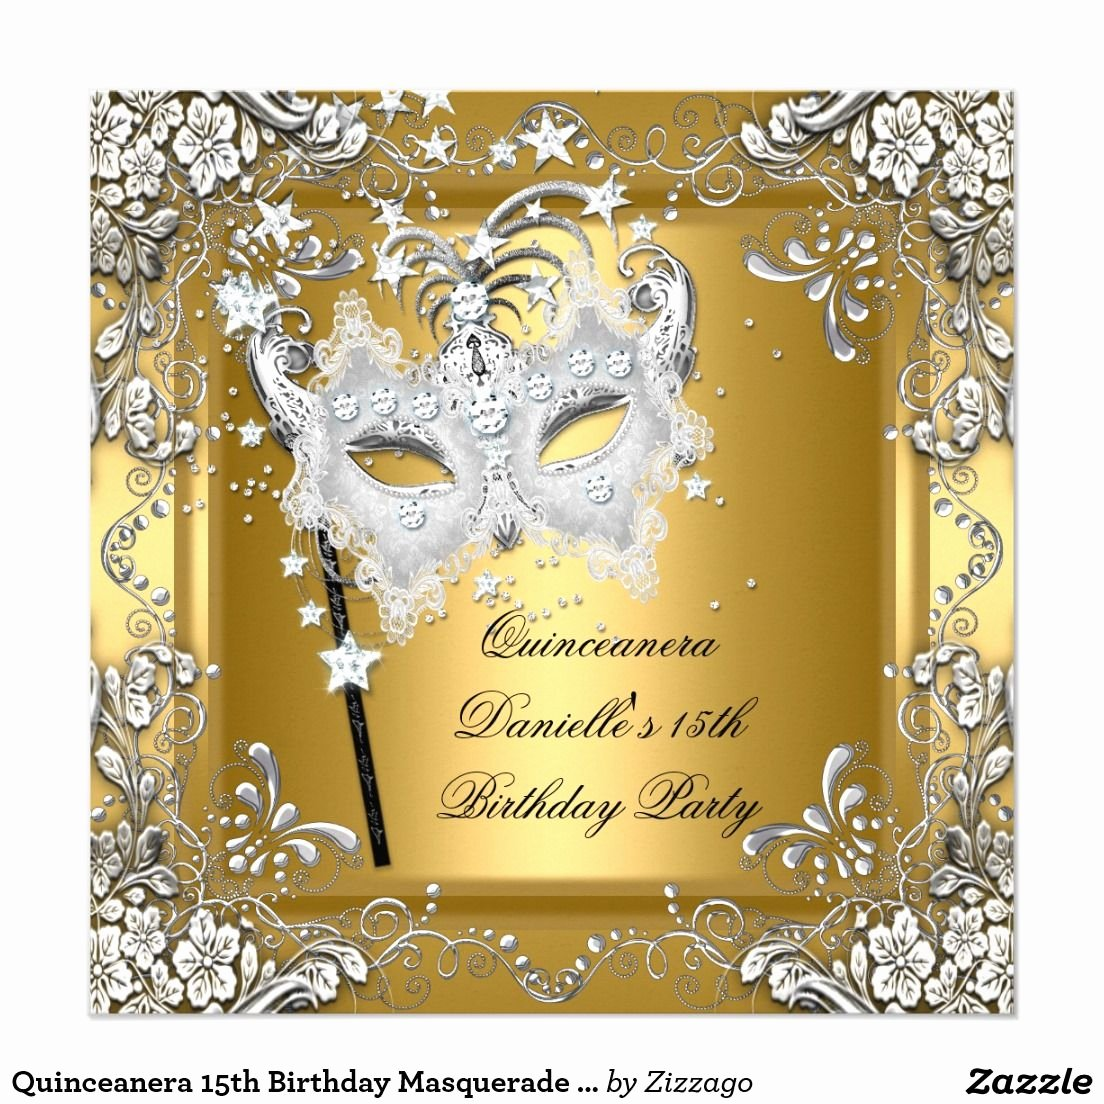 Masquerade Invitations for Quinceaneras New Quinceanera 15th Birthday Masquerade Mask Gold Invitation